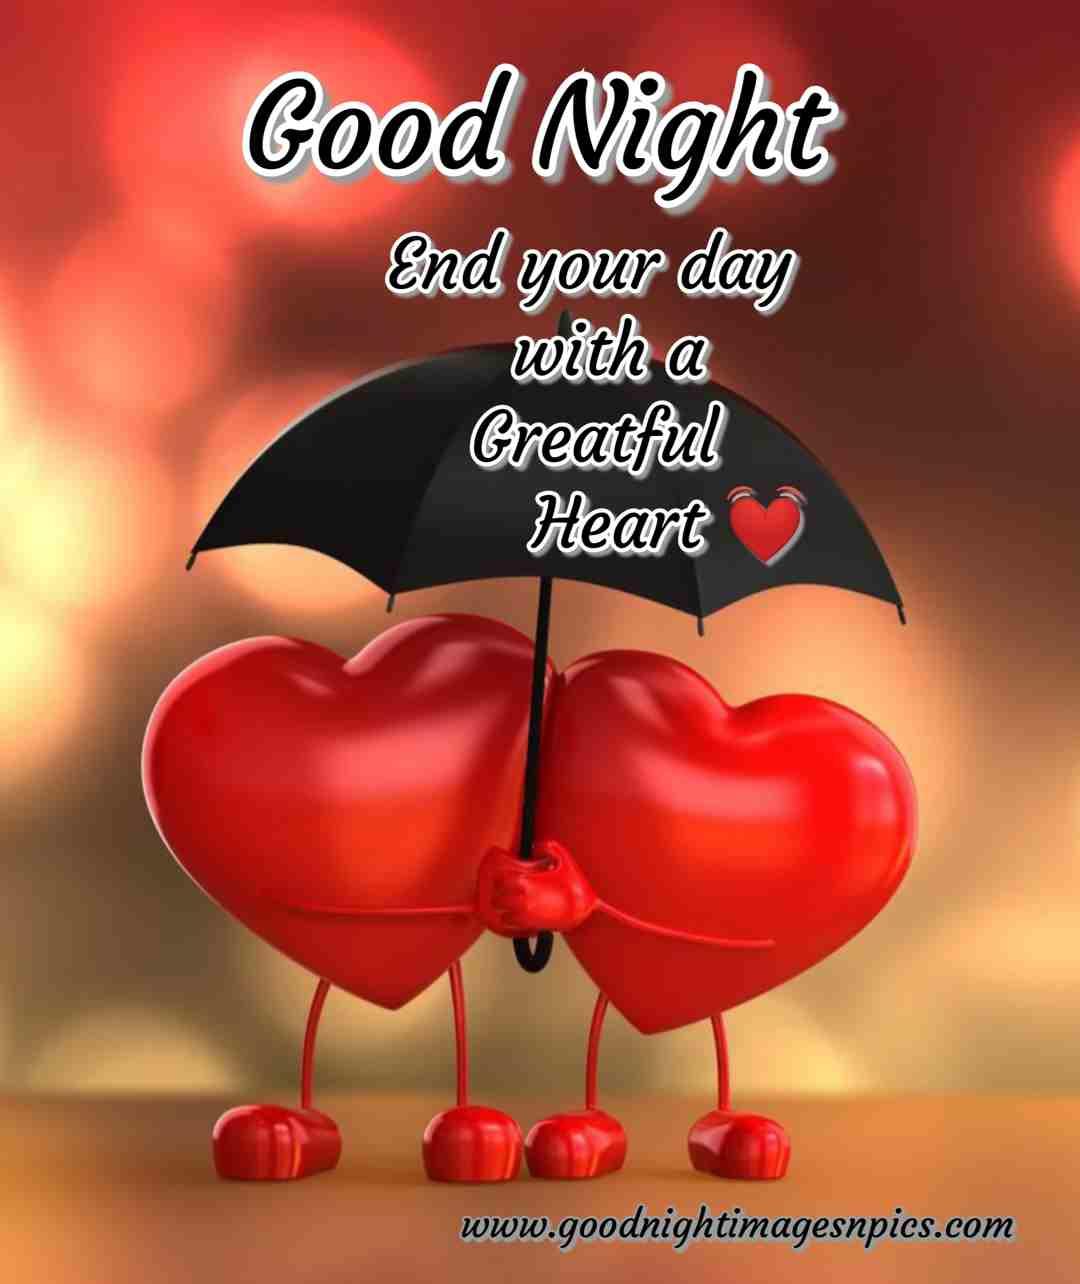 Good night hd photos